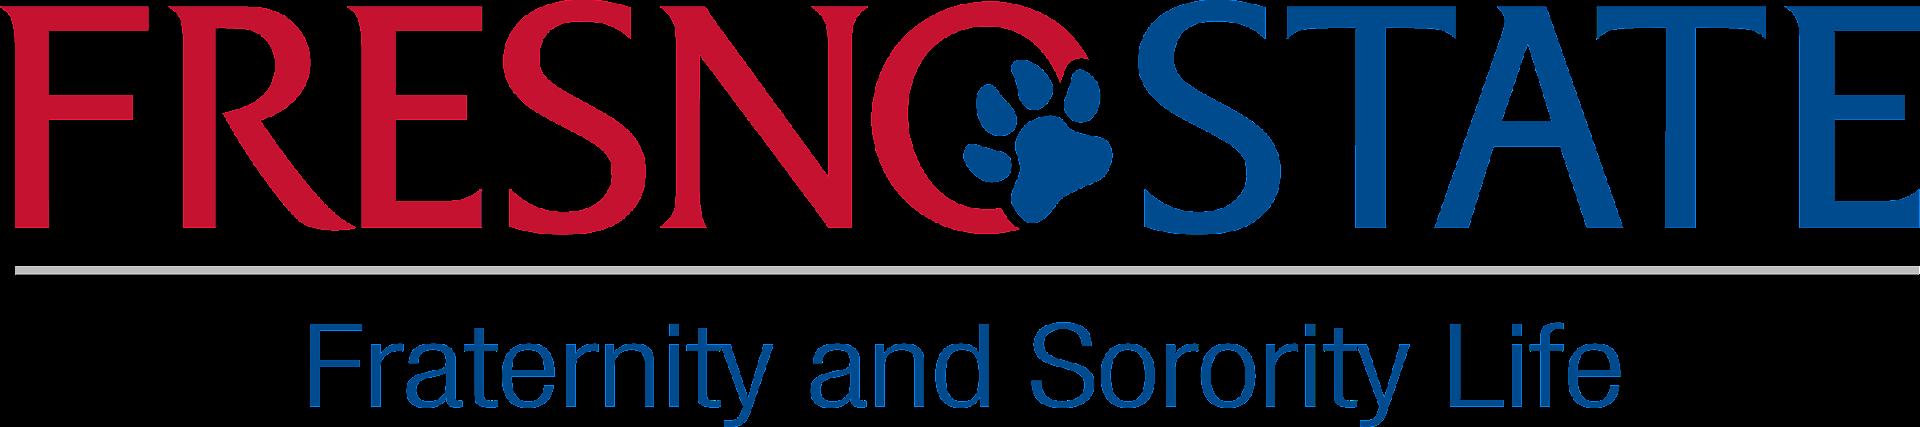 Fraternity and Sorority Life Logo